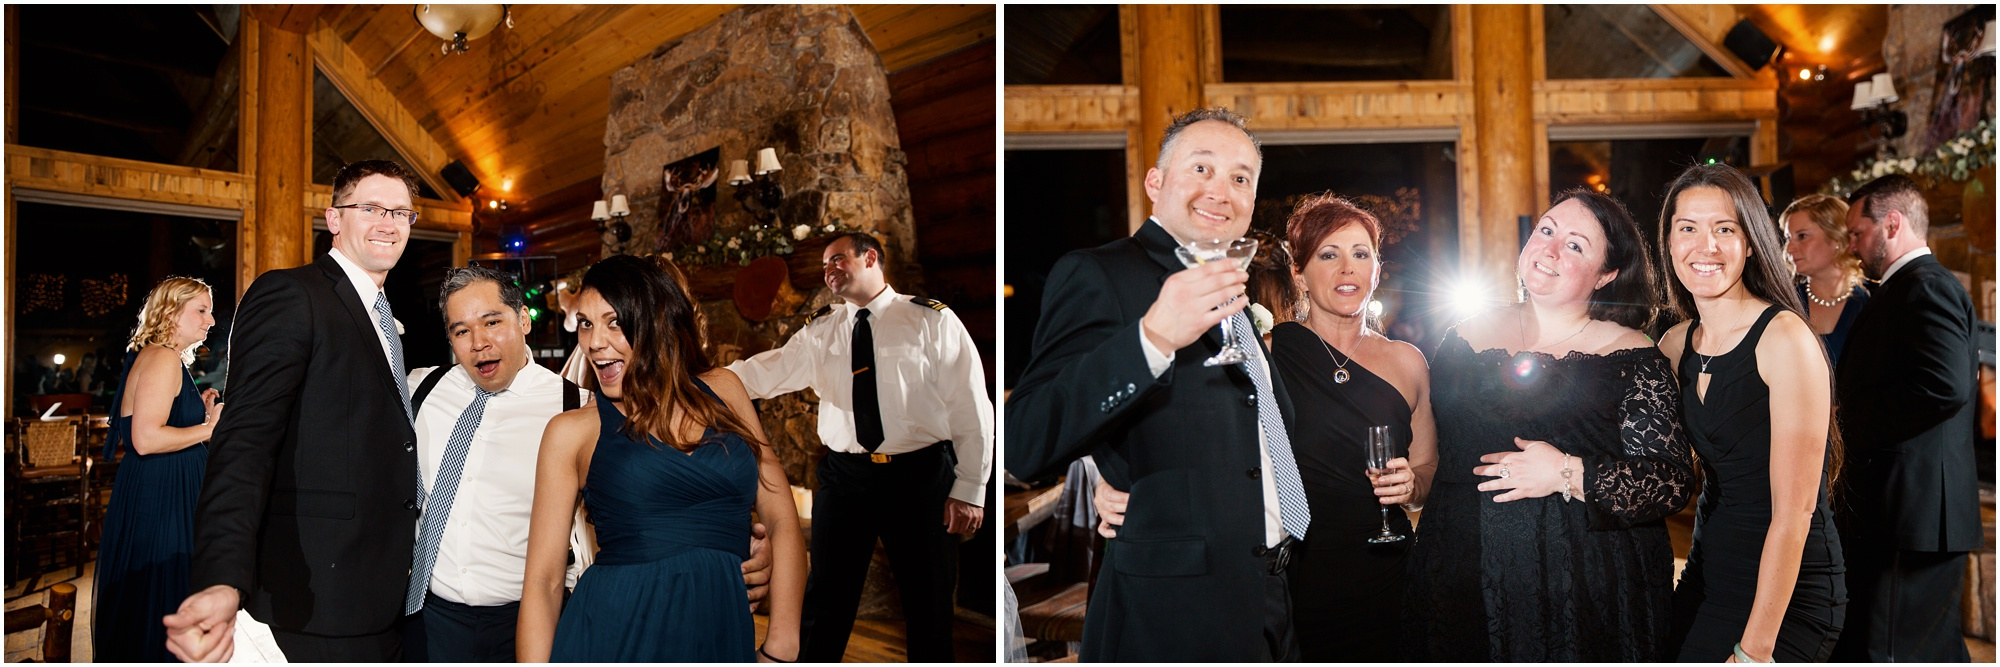 Breckenridge-Wedding-Photographer_0068.jpg